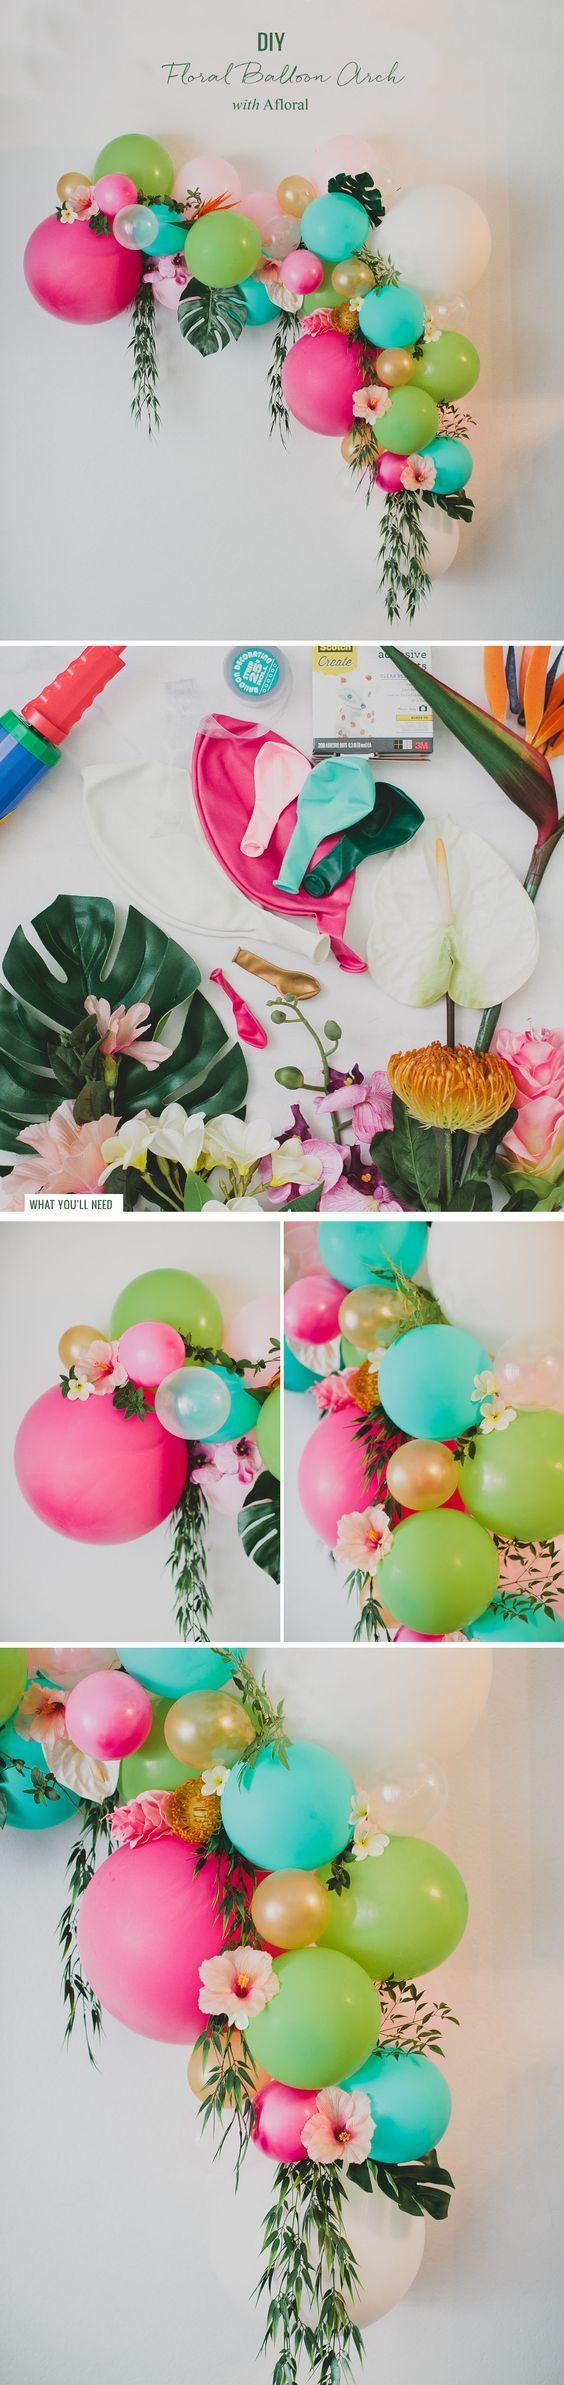 Moana Wedding Theme Decor Fantastical Weddings Decor fantasticalweddings.com DIY Floral Balloon Arch   Greenweddingshoes.com